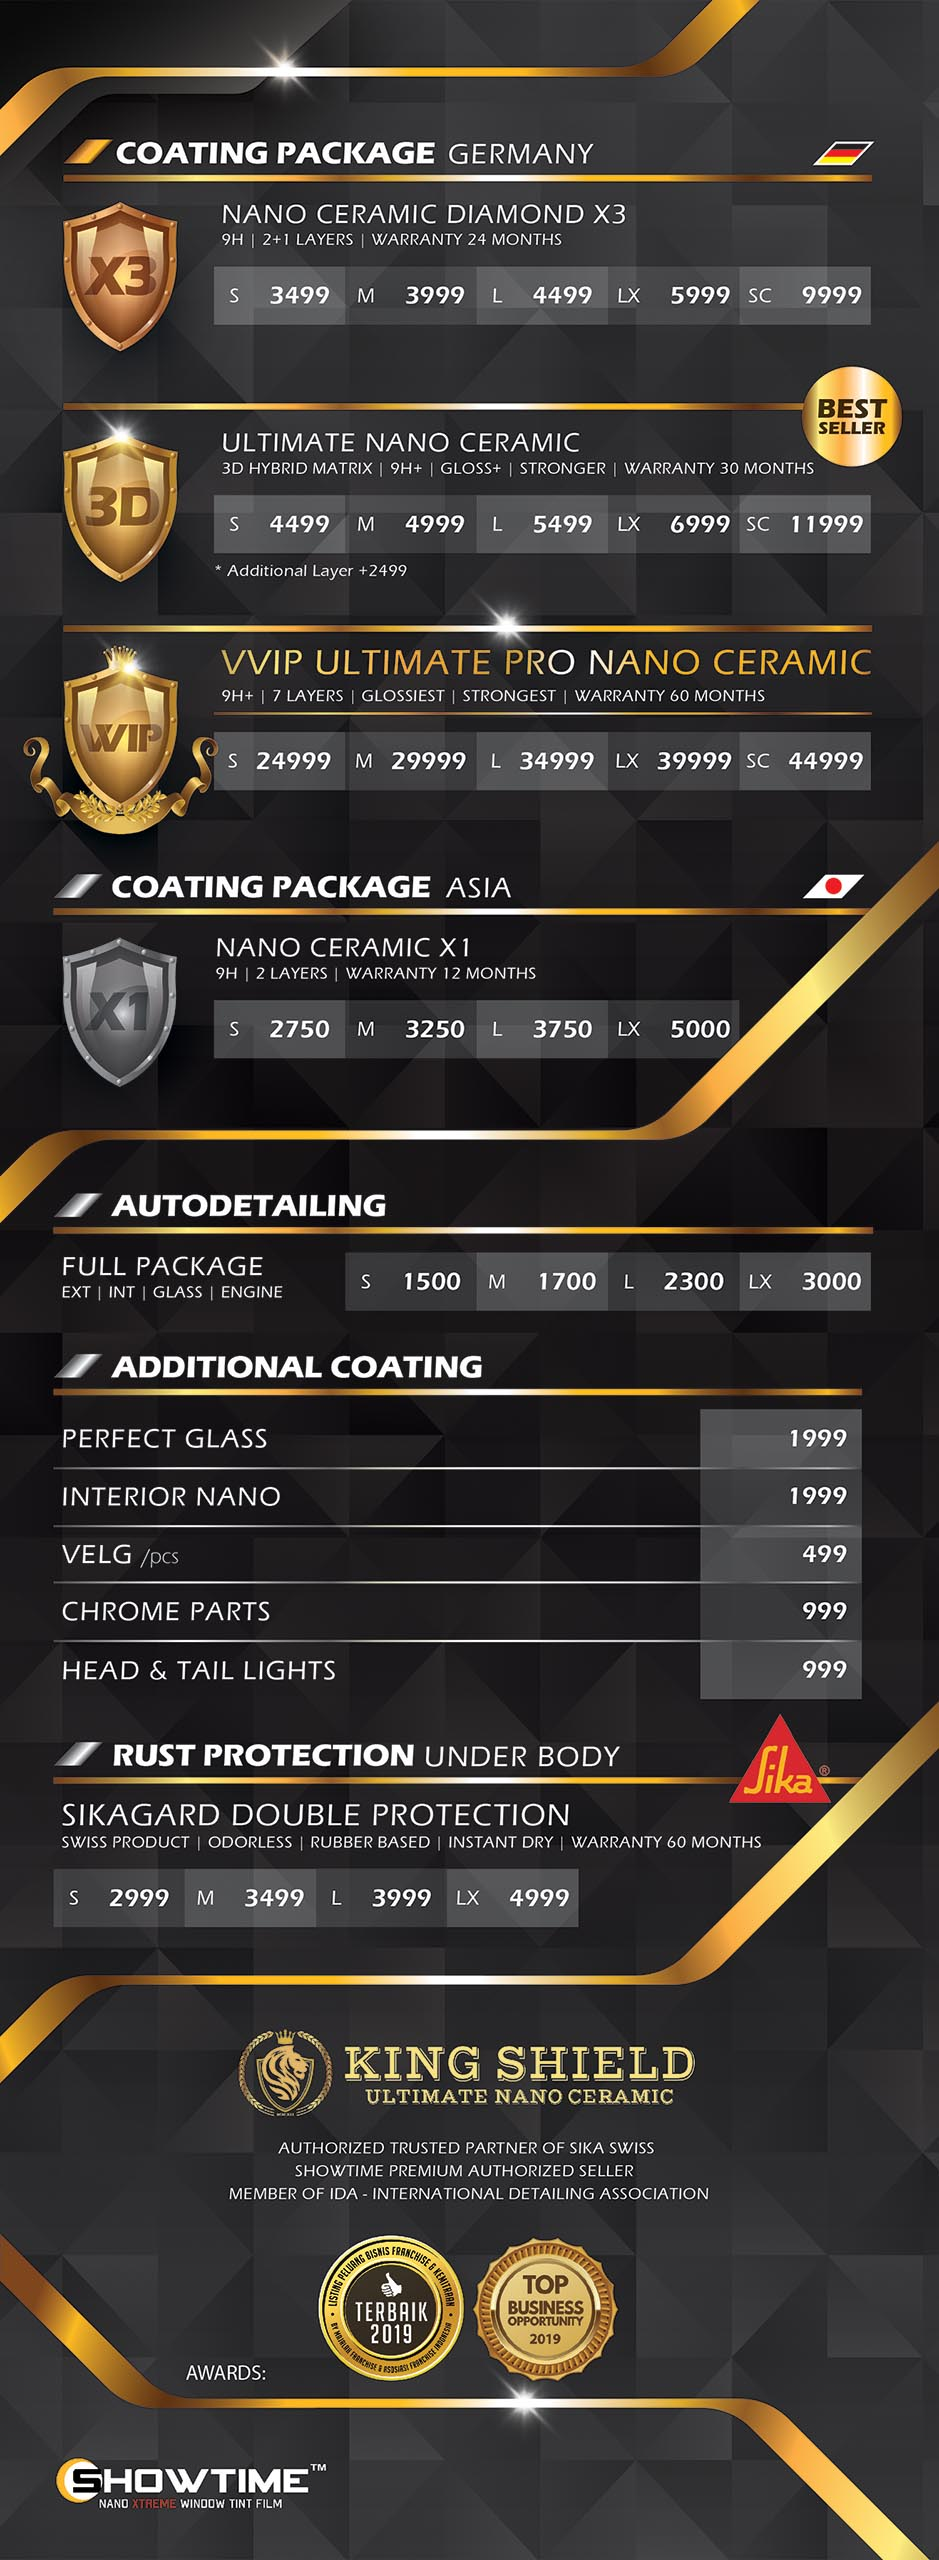 Price list King Shield website